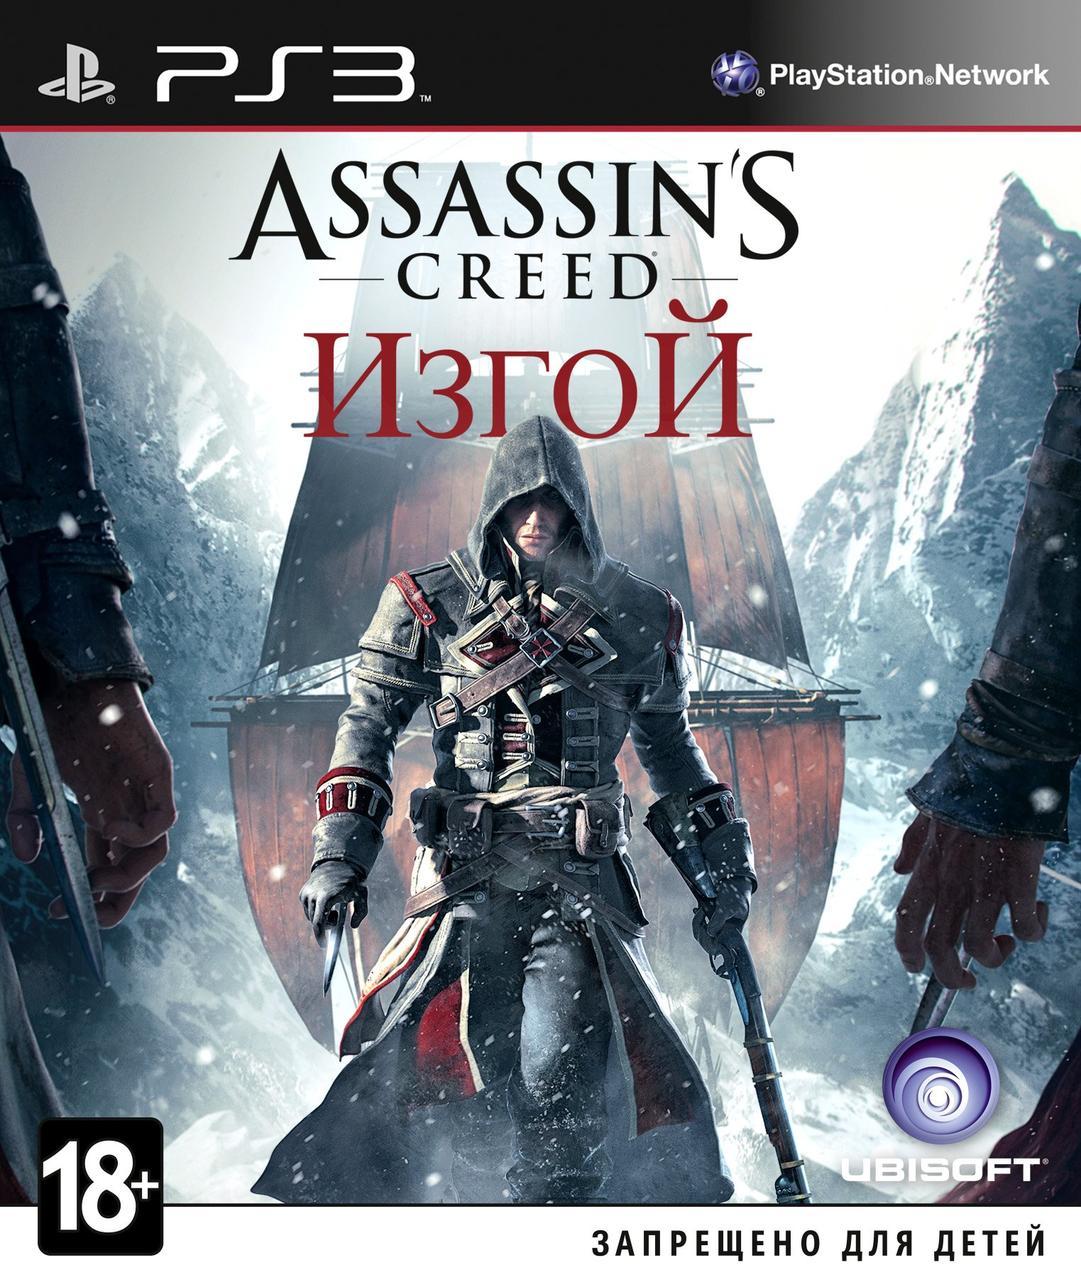 Assassins Creed Rogue (з російськими субтитрами) PS3